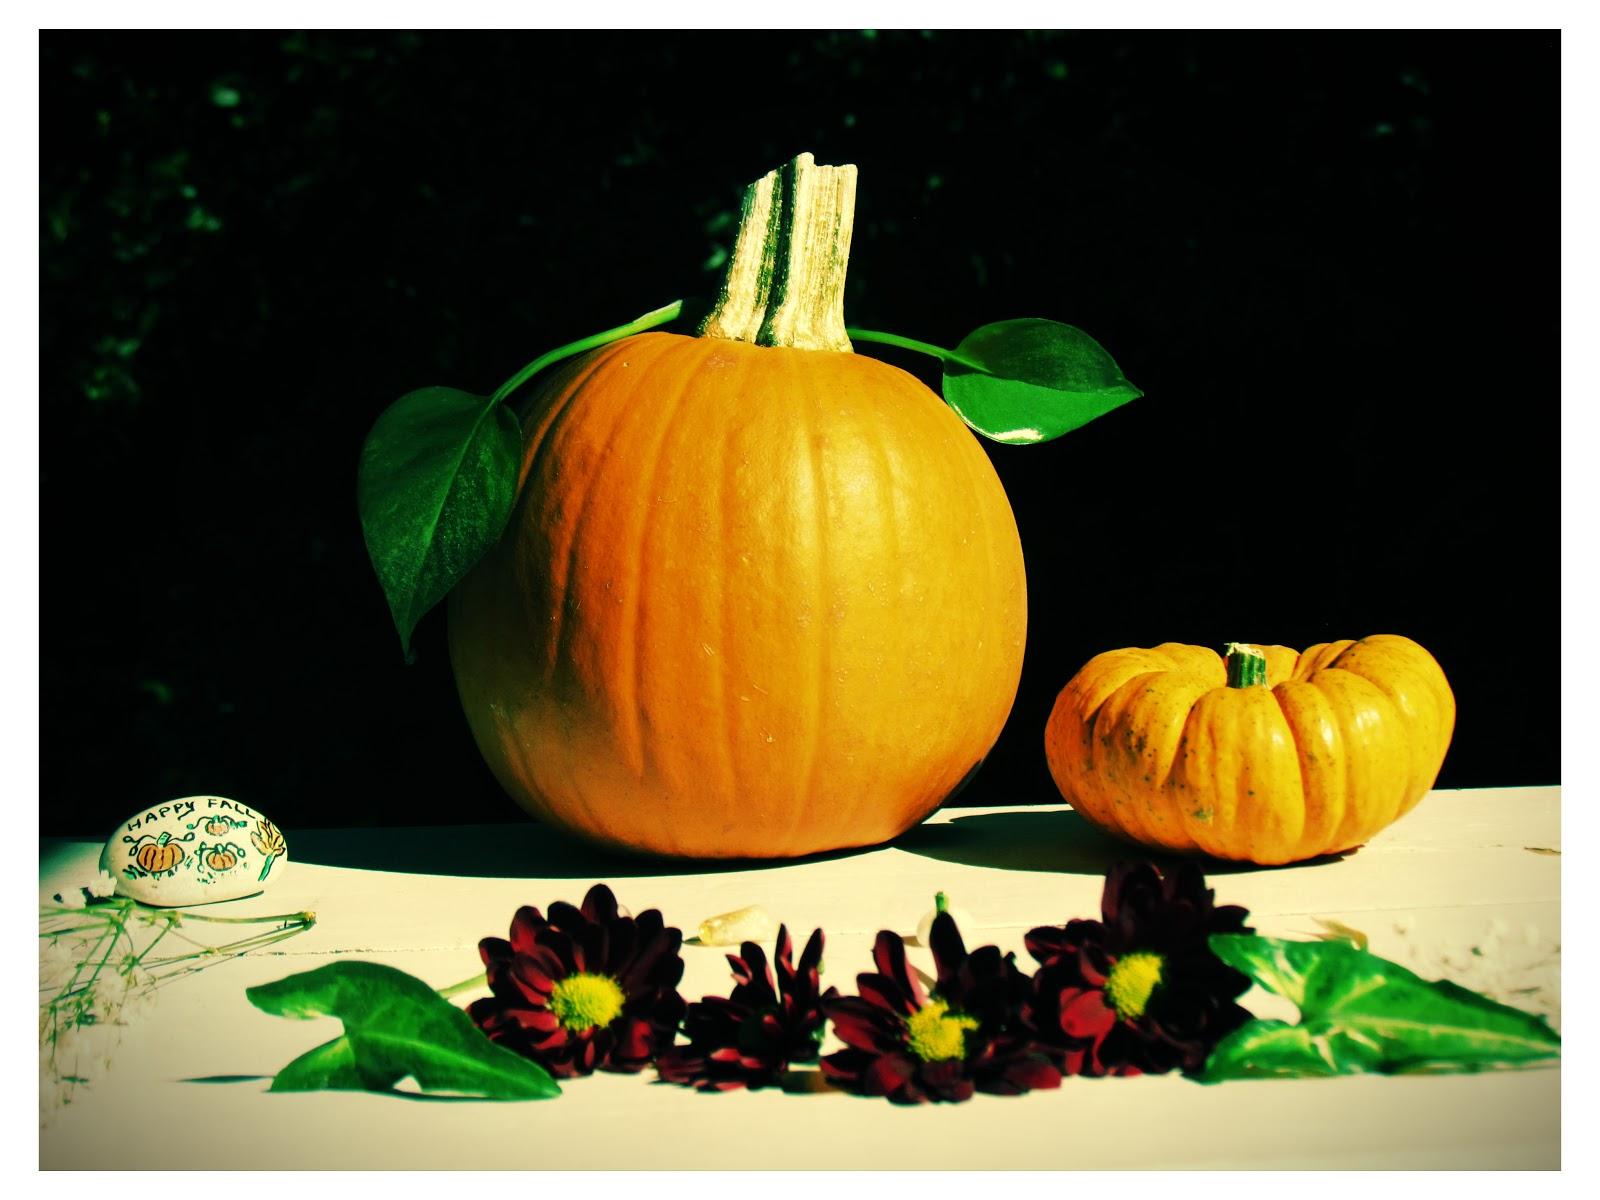 Green Living Plants and Pumpkins For Halloween Elegance